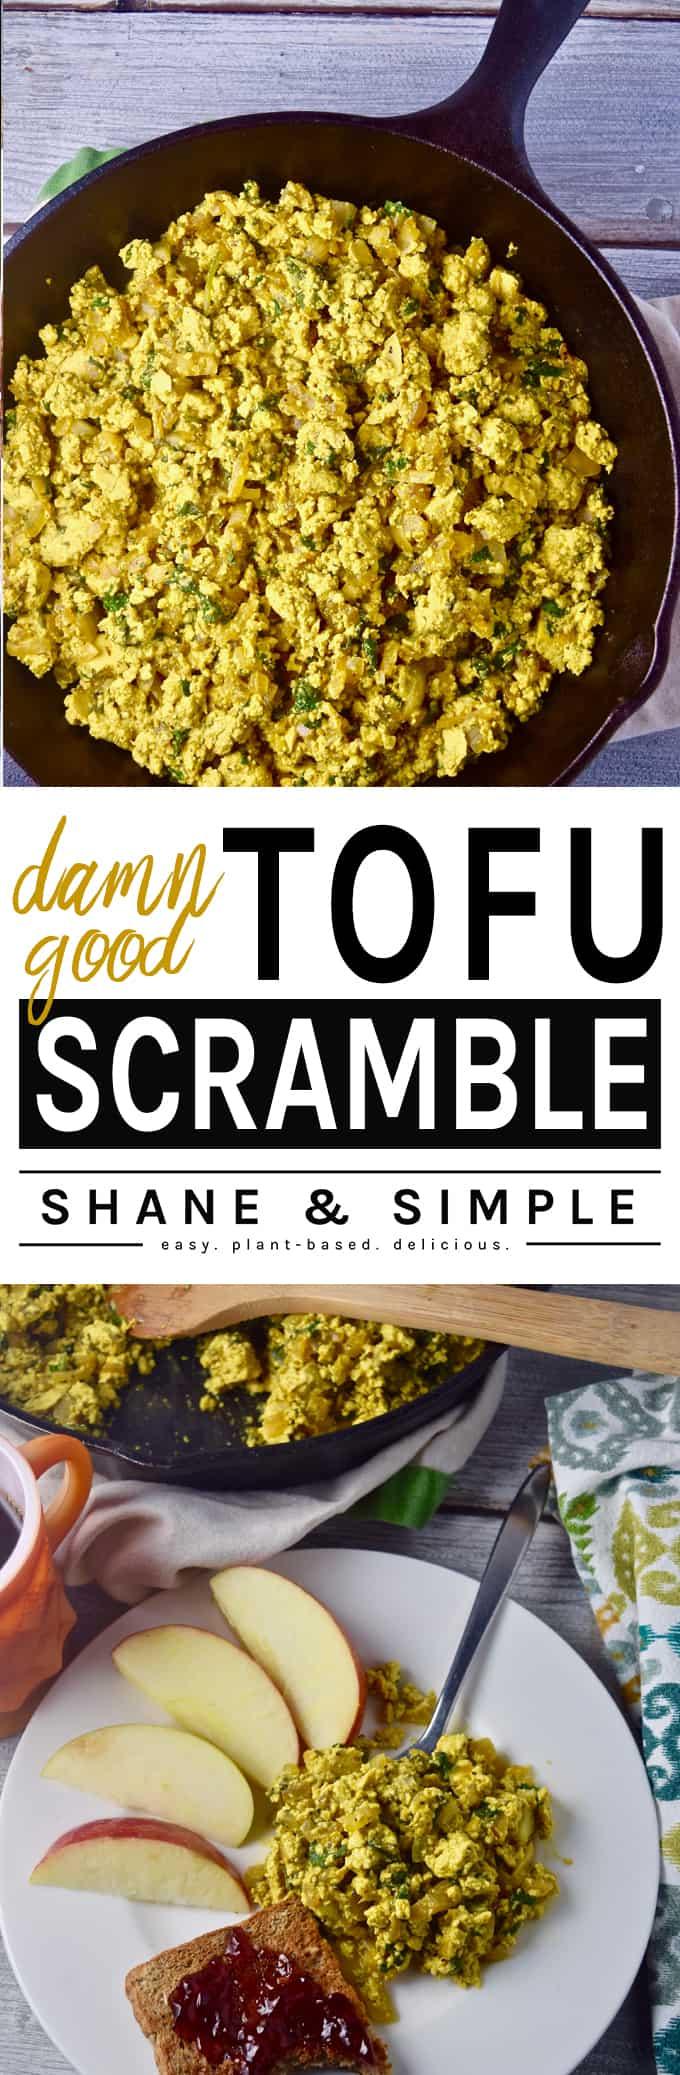 Damn Good Tofu Scramble